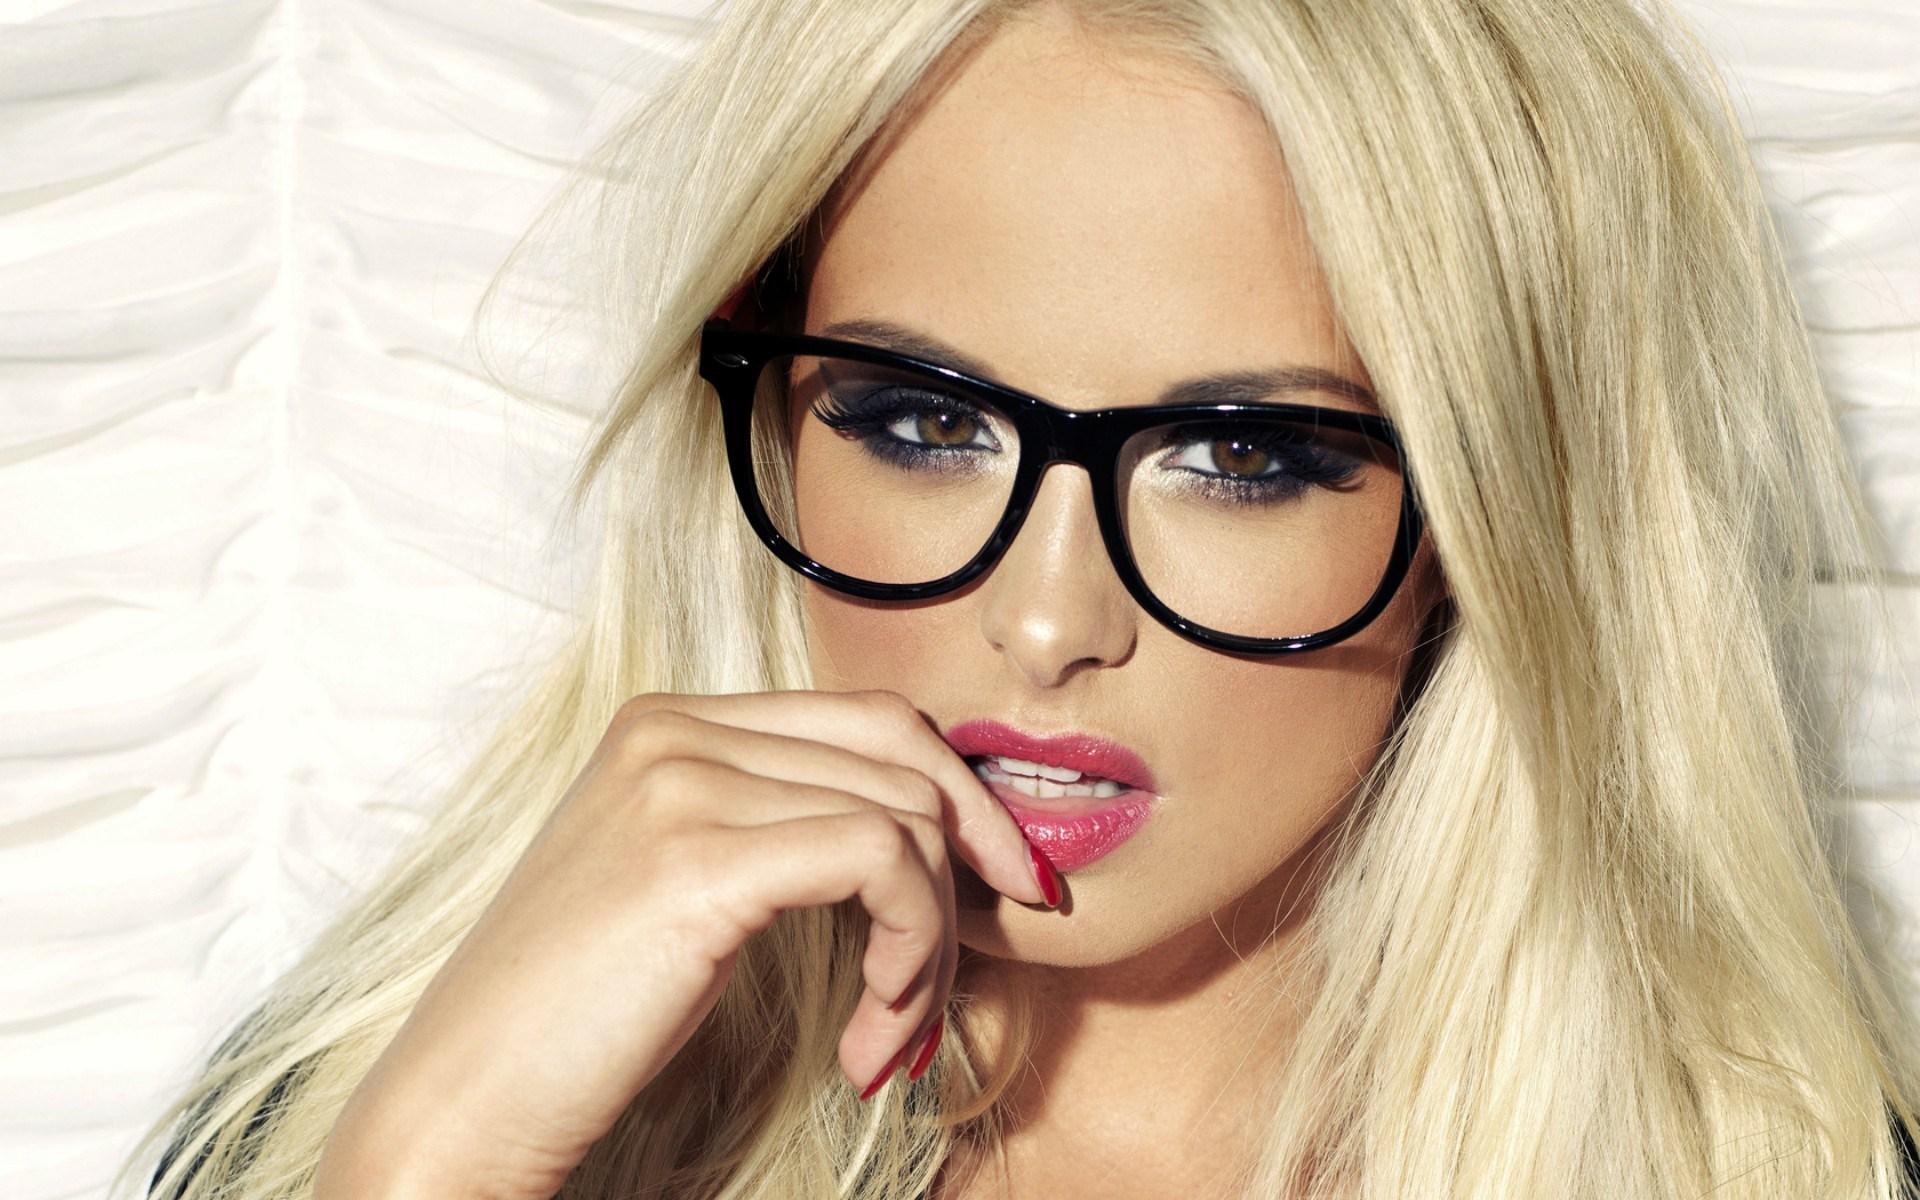 Beauty Woman Blonde Glasses Fashion